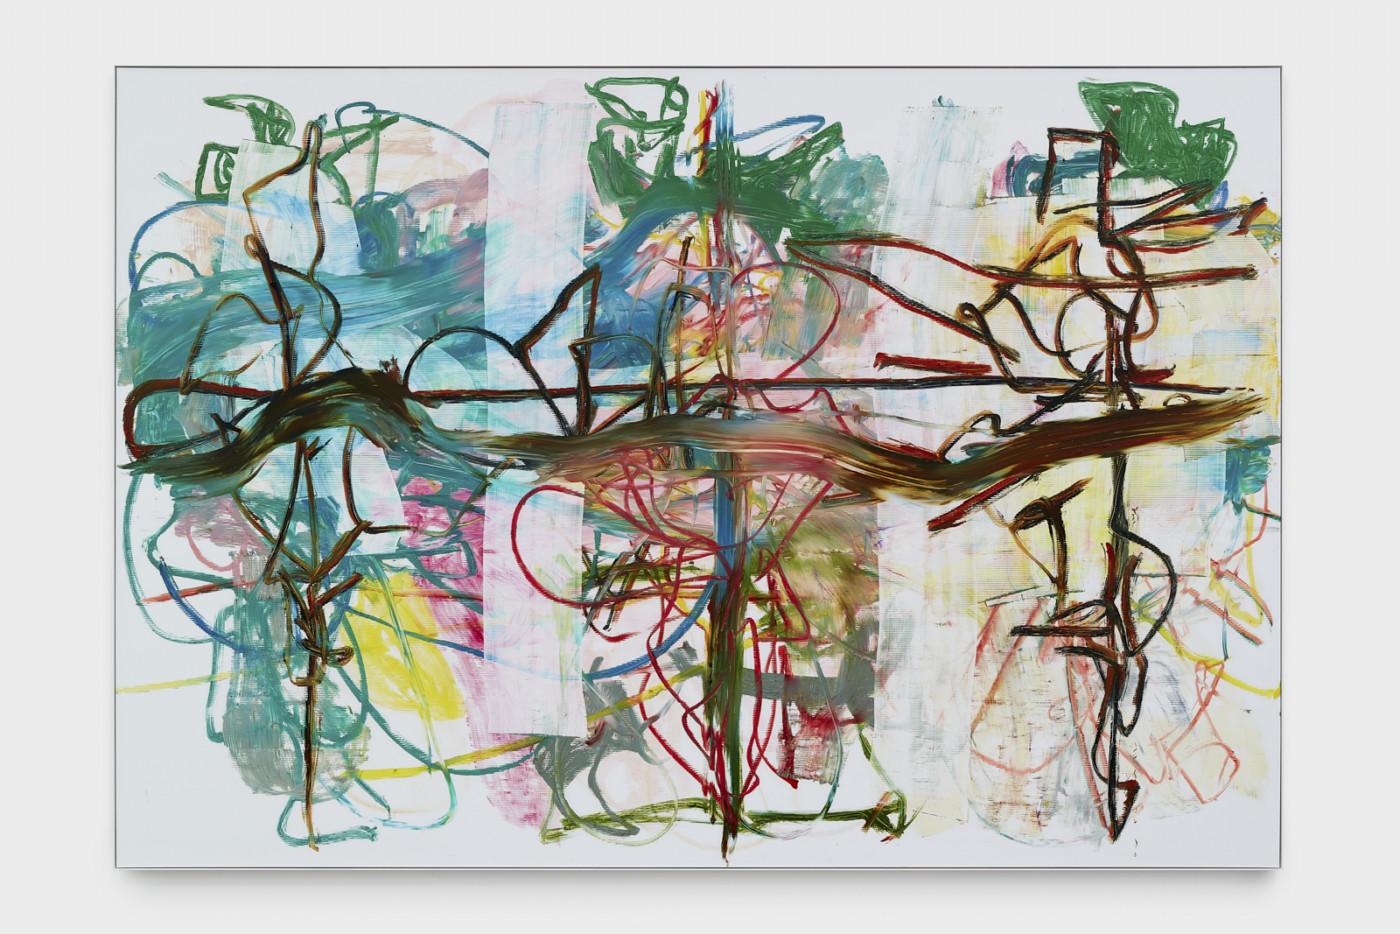 AARON  GARBER-MAIKOVSKA  Performance,  2019 Oil on fluted poly 246,7 x 358,5 x 5,1 cm / 97 1/8 x 141 1/8 x 2 in - High Art Gallery Paris